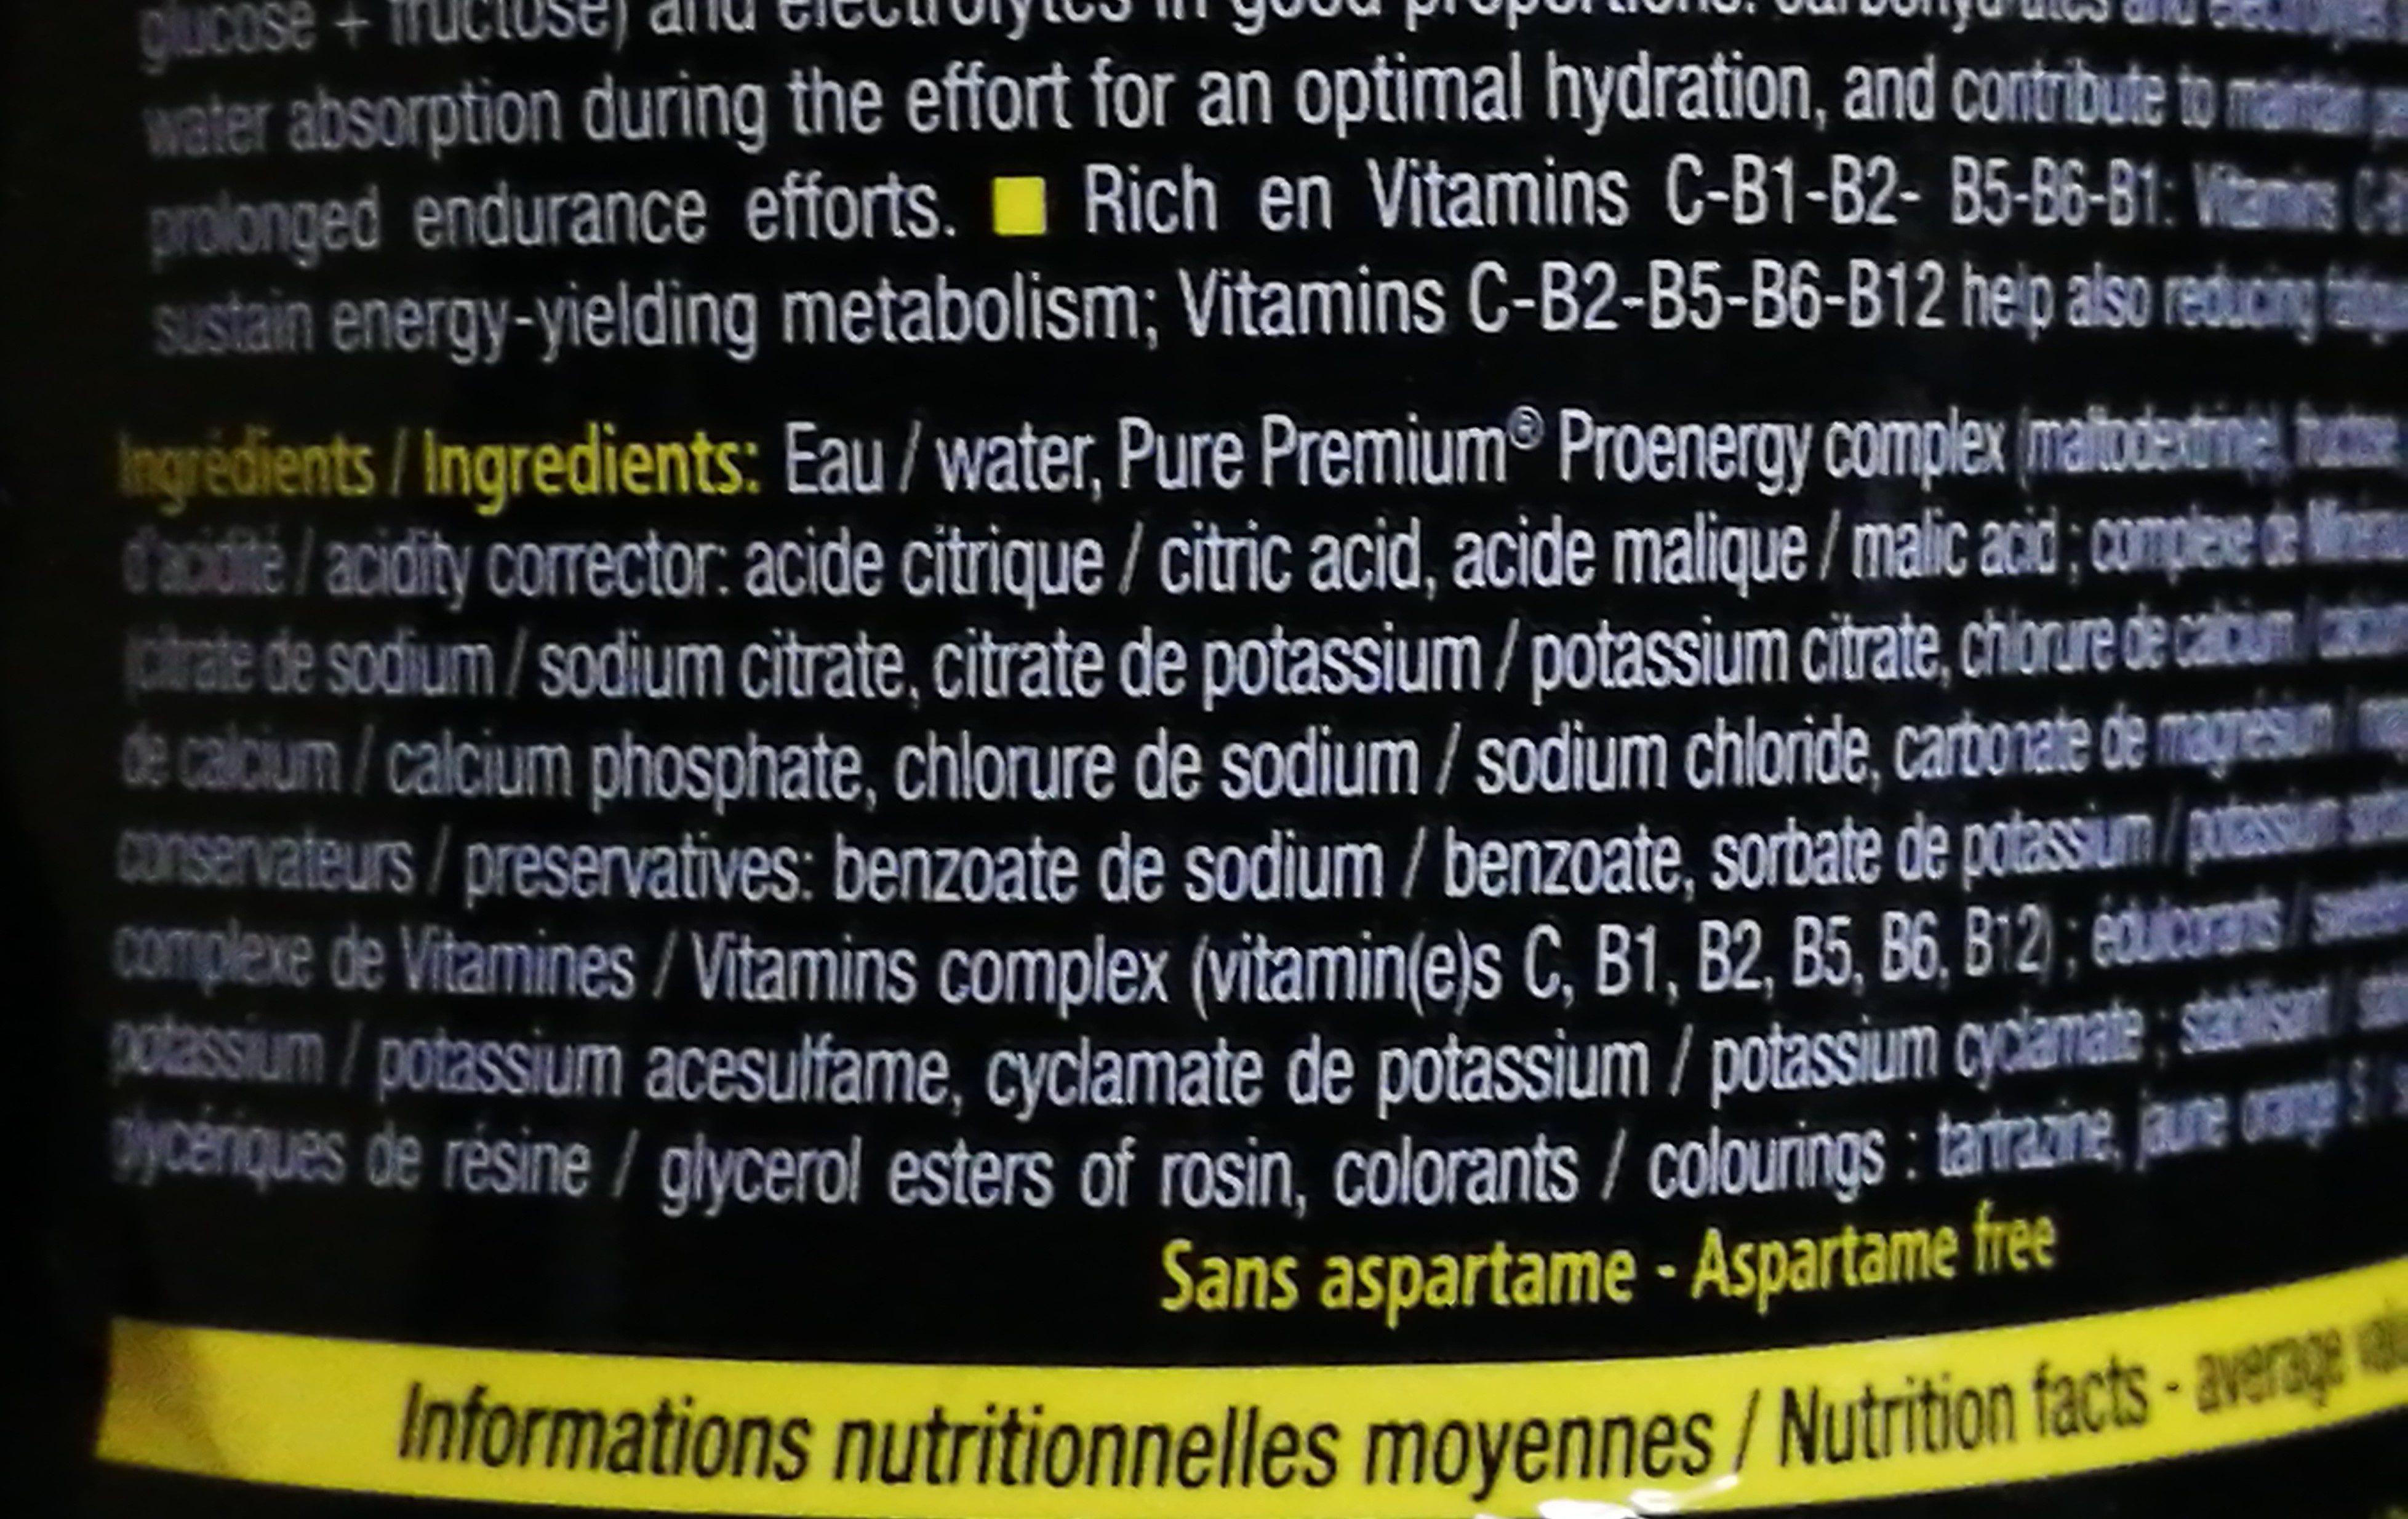 STC Nutrition Mineral Drink énergie, Gout Orange - Bouteille - Ingrédients - fr